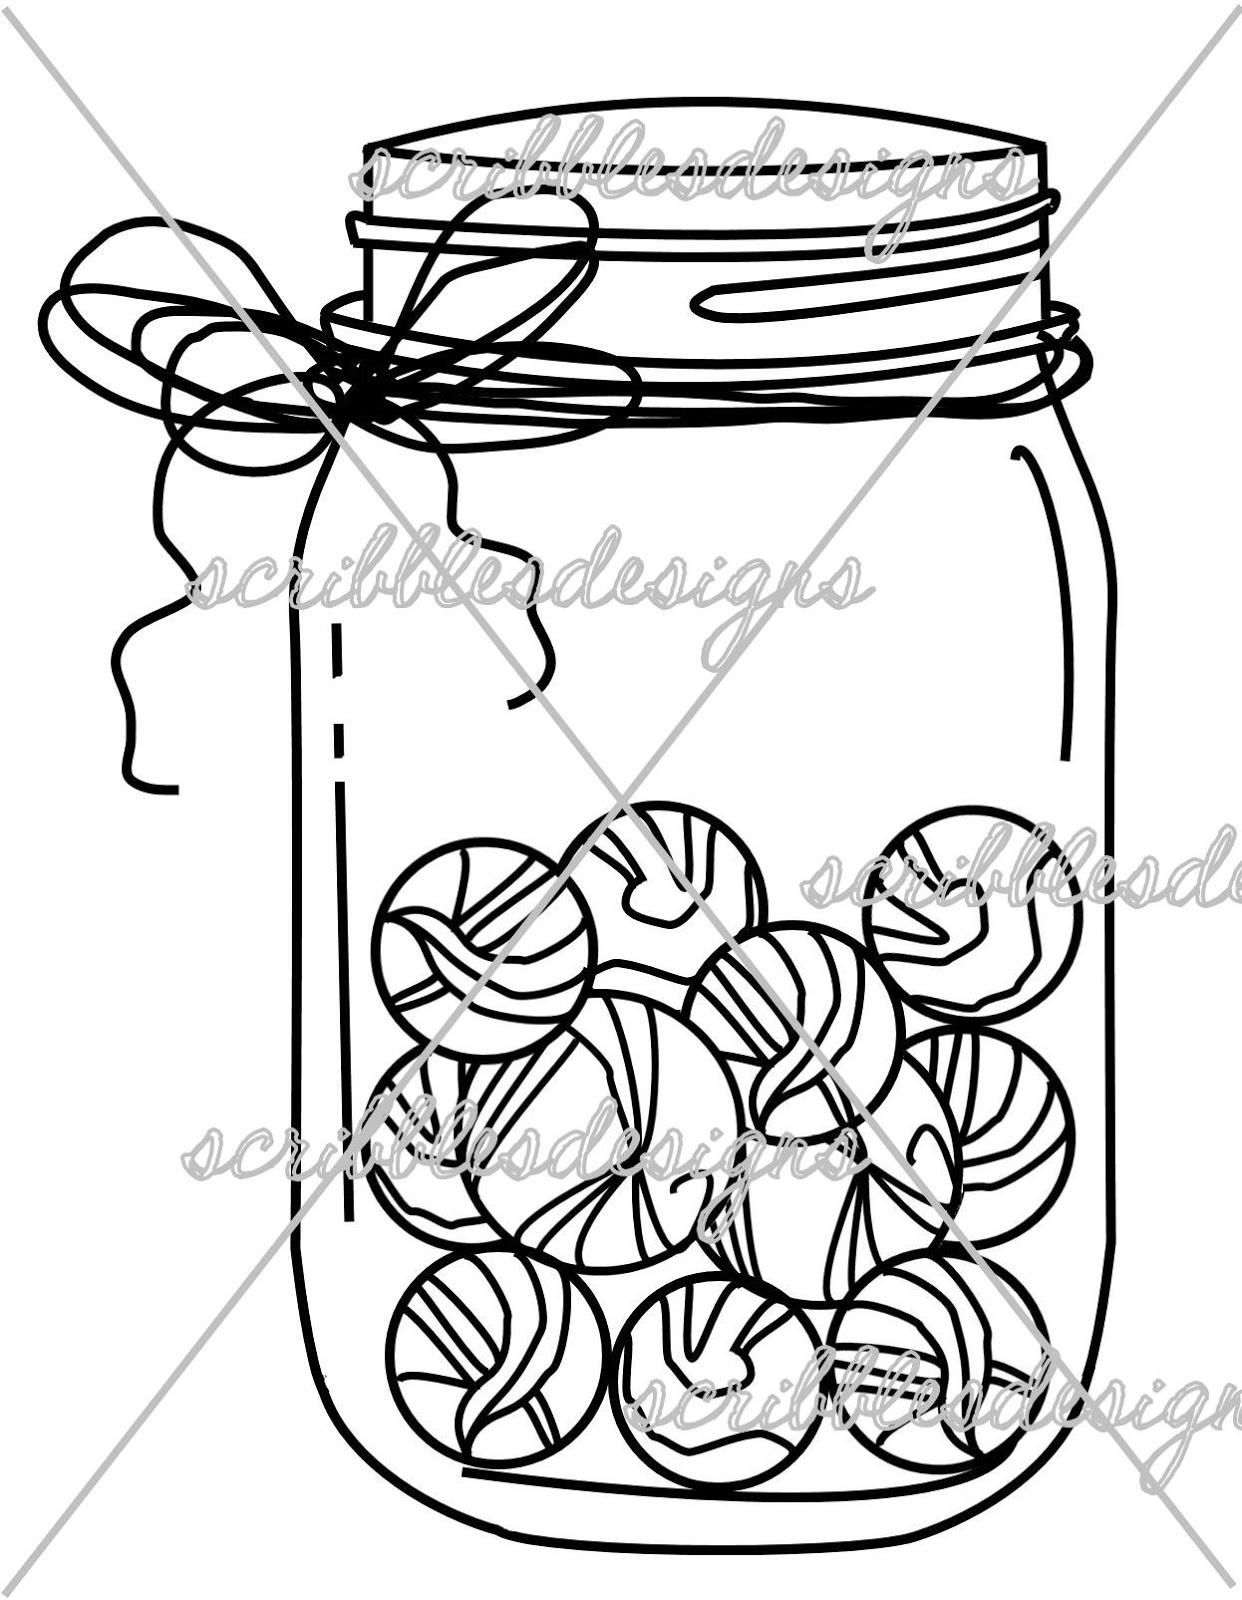 Mason Jar Coloring Page Scribbles Designs 8101 Marbles Mason Jar $3.00